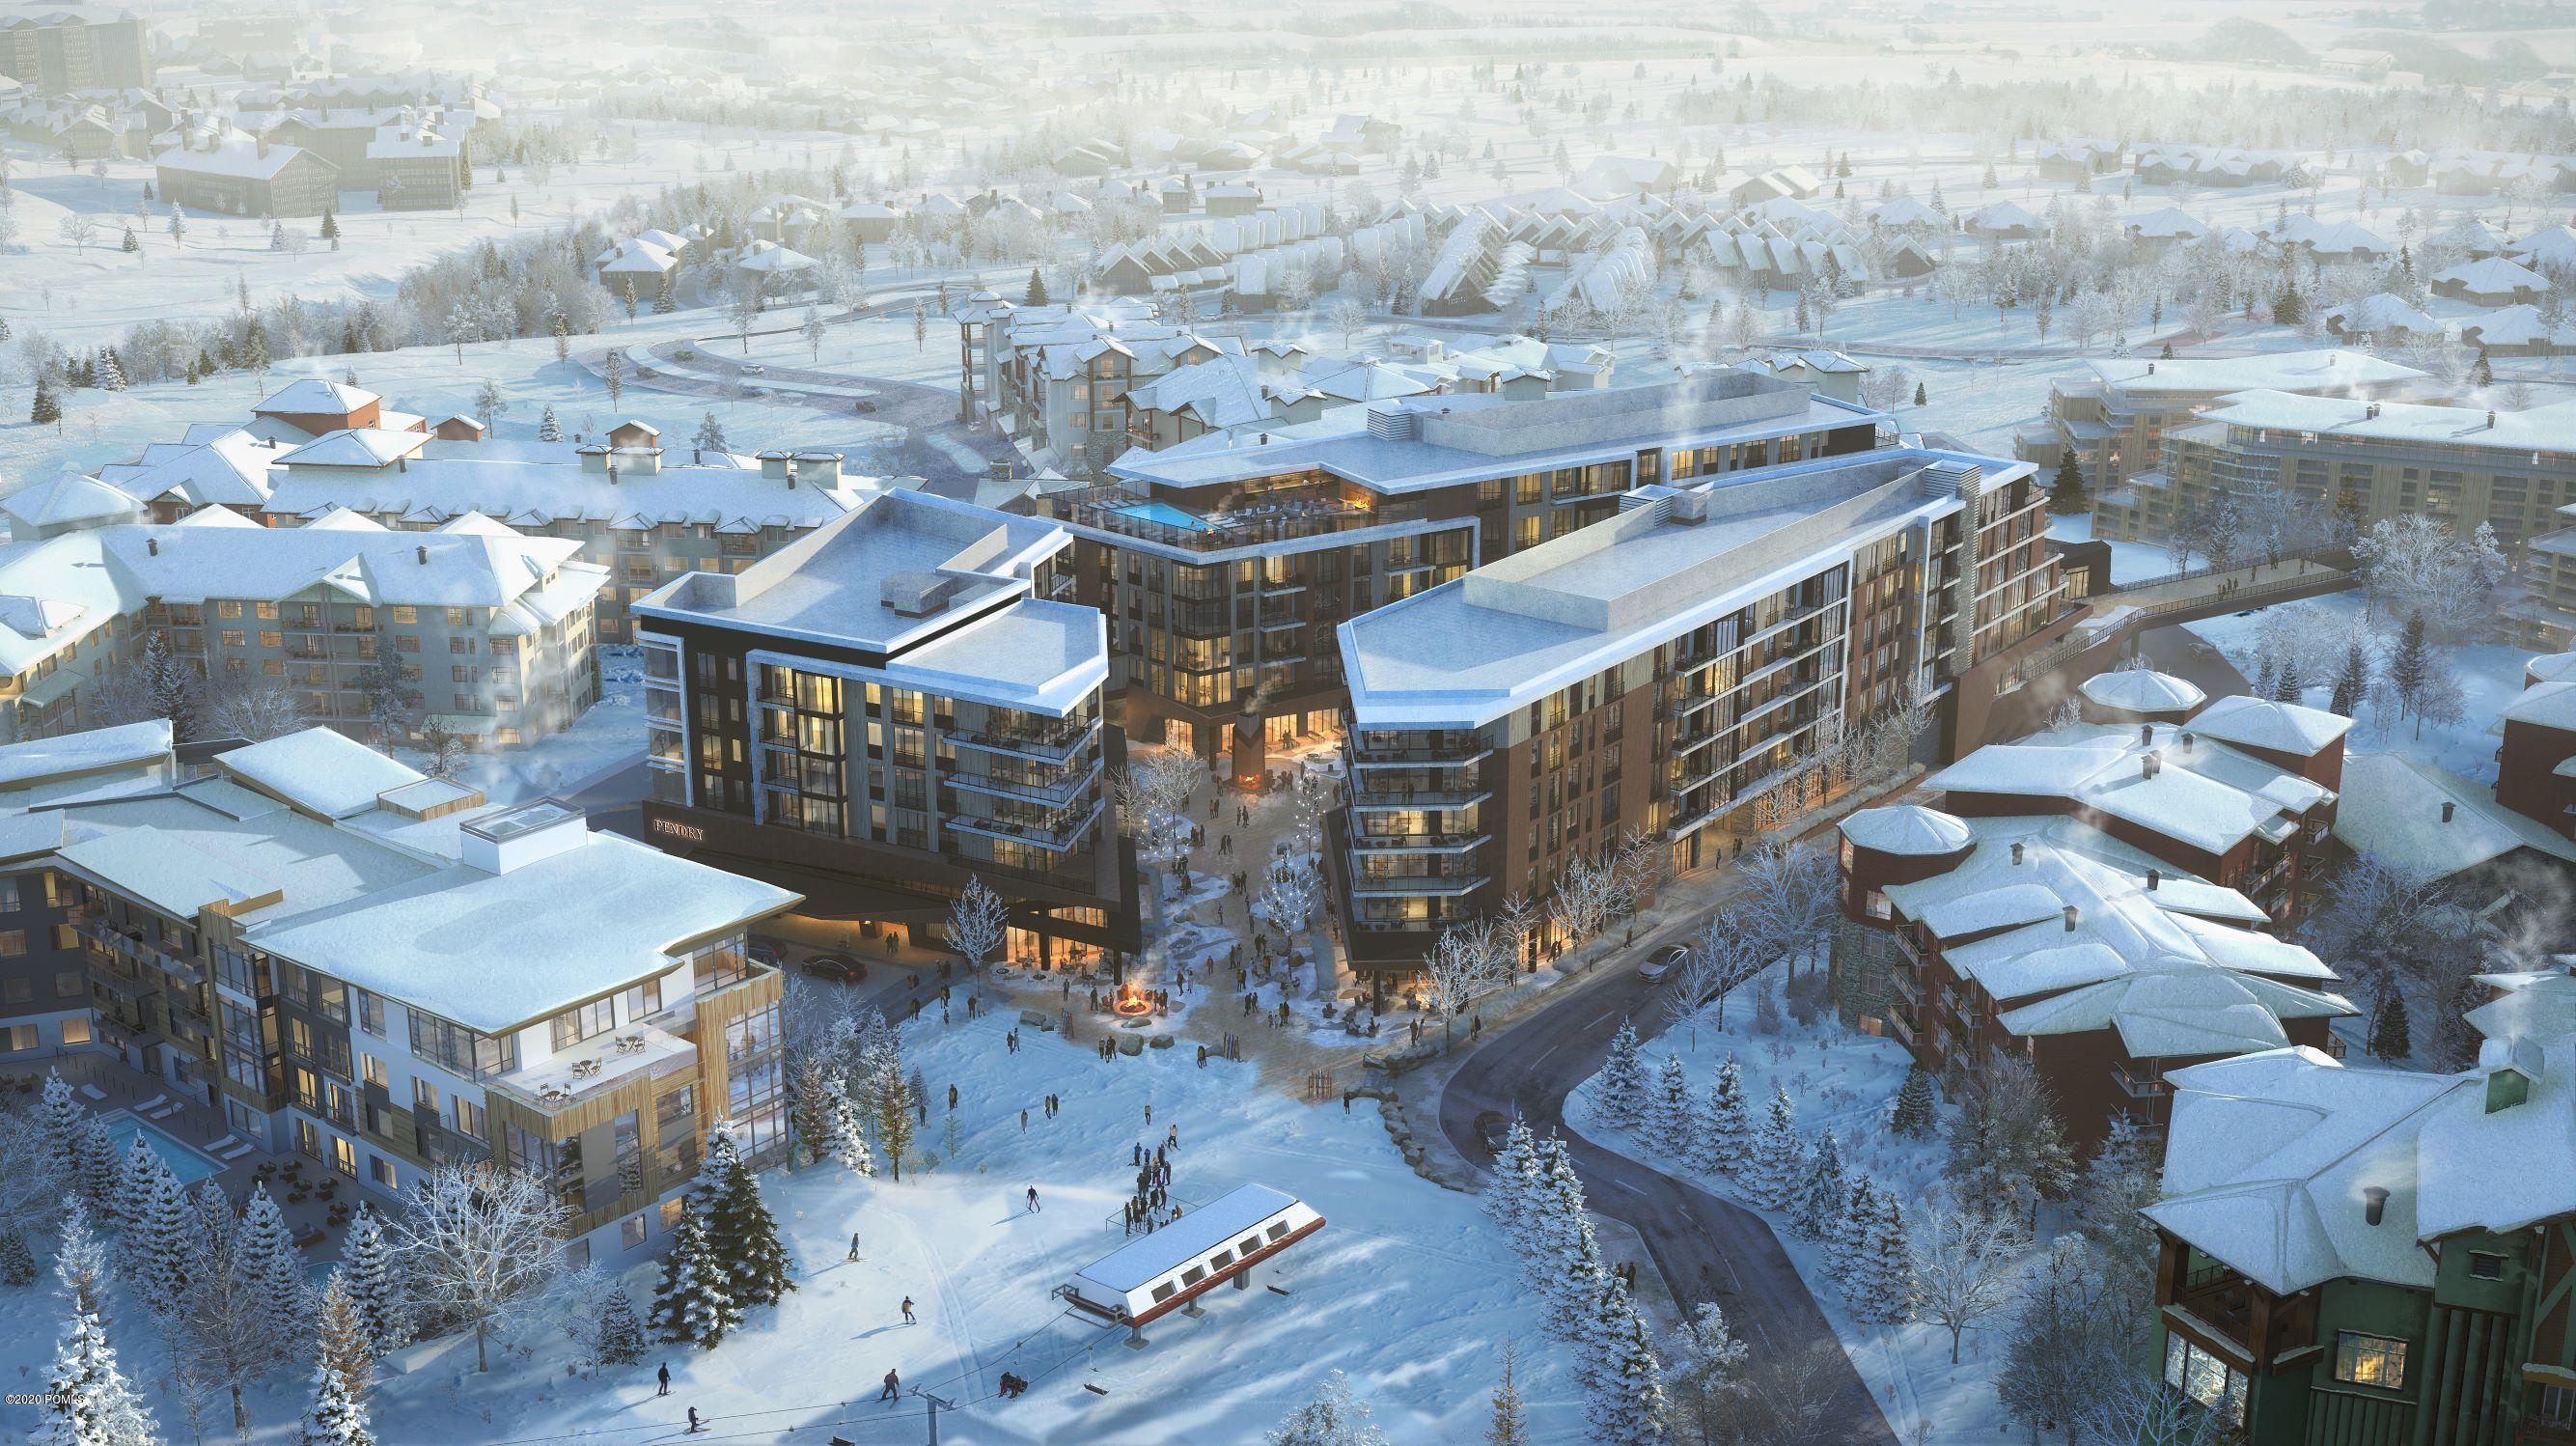 2417 High Mountain Road, Park City, Utah 84060, 4 Bedrooms Bedrooms, ,5 BathroomsBathrooms,Condominium,For Sale,High Mountain,12004528